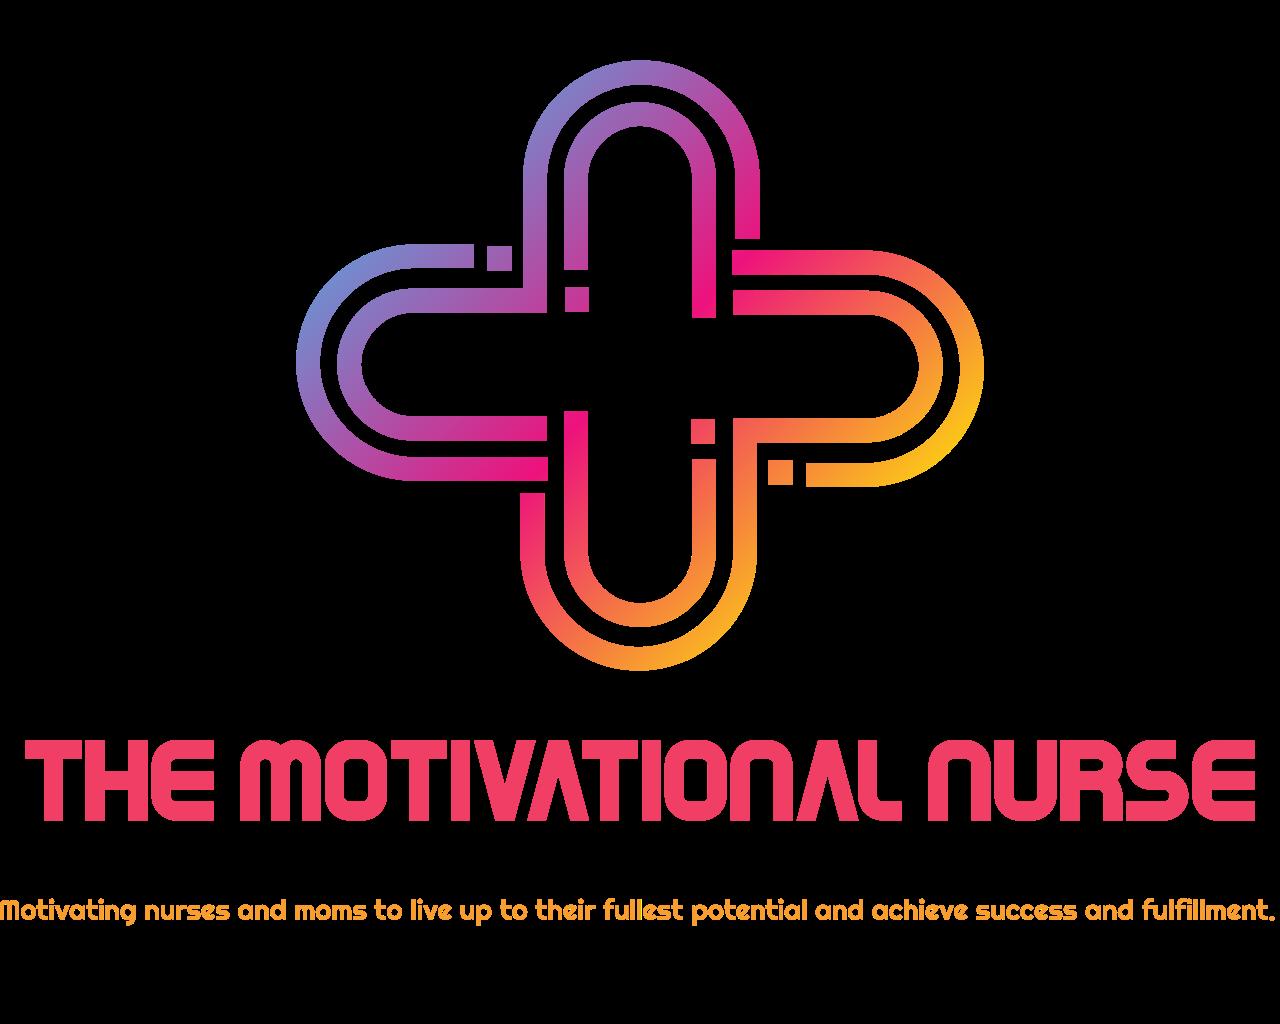 The Motivational Nurse